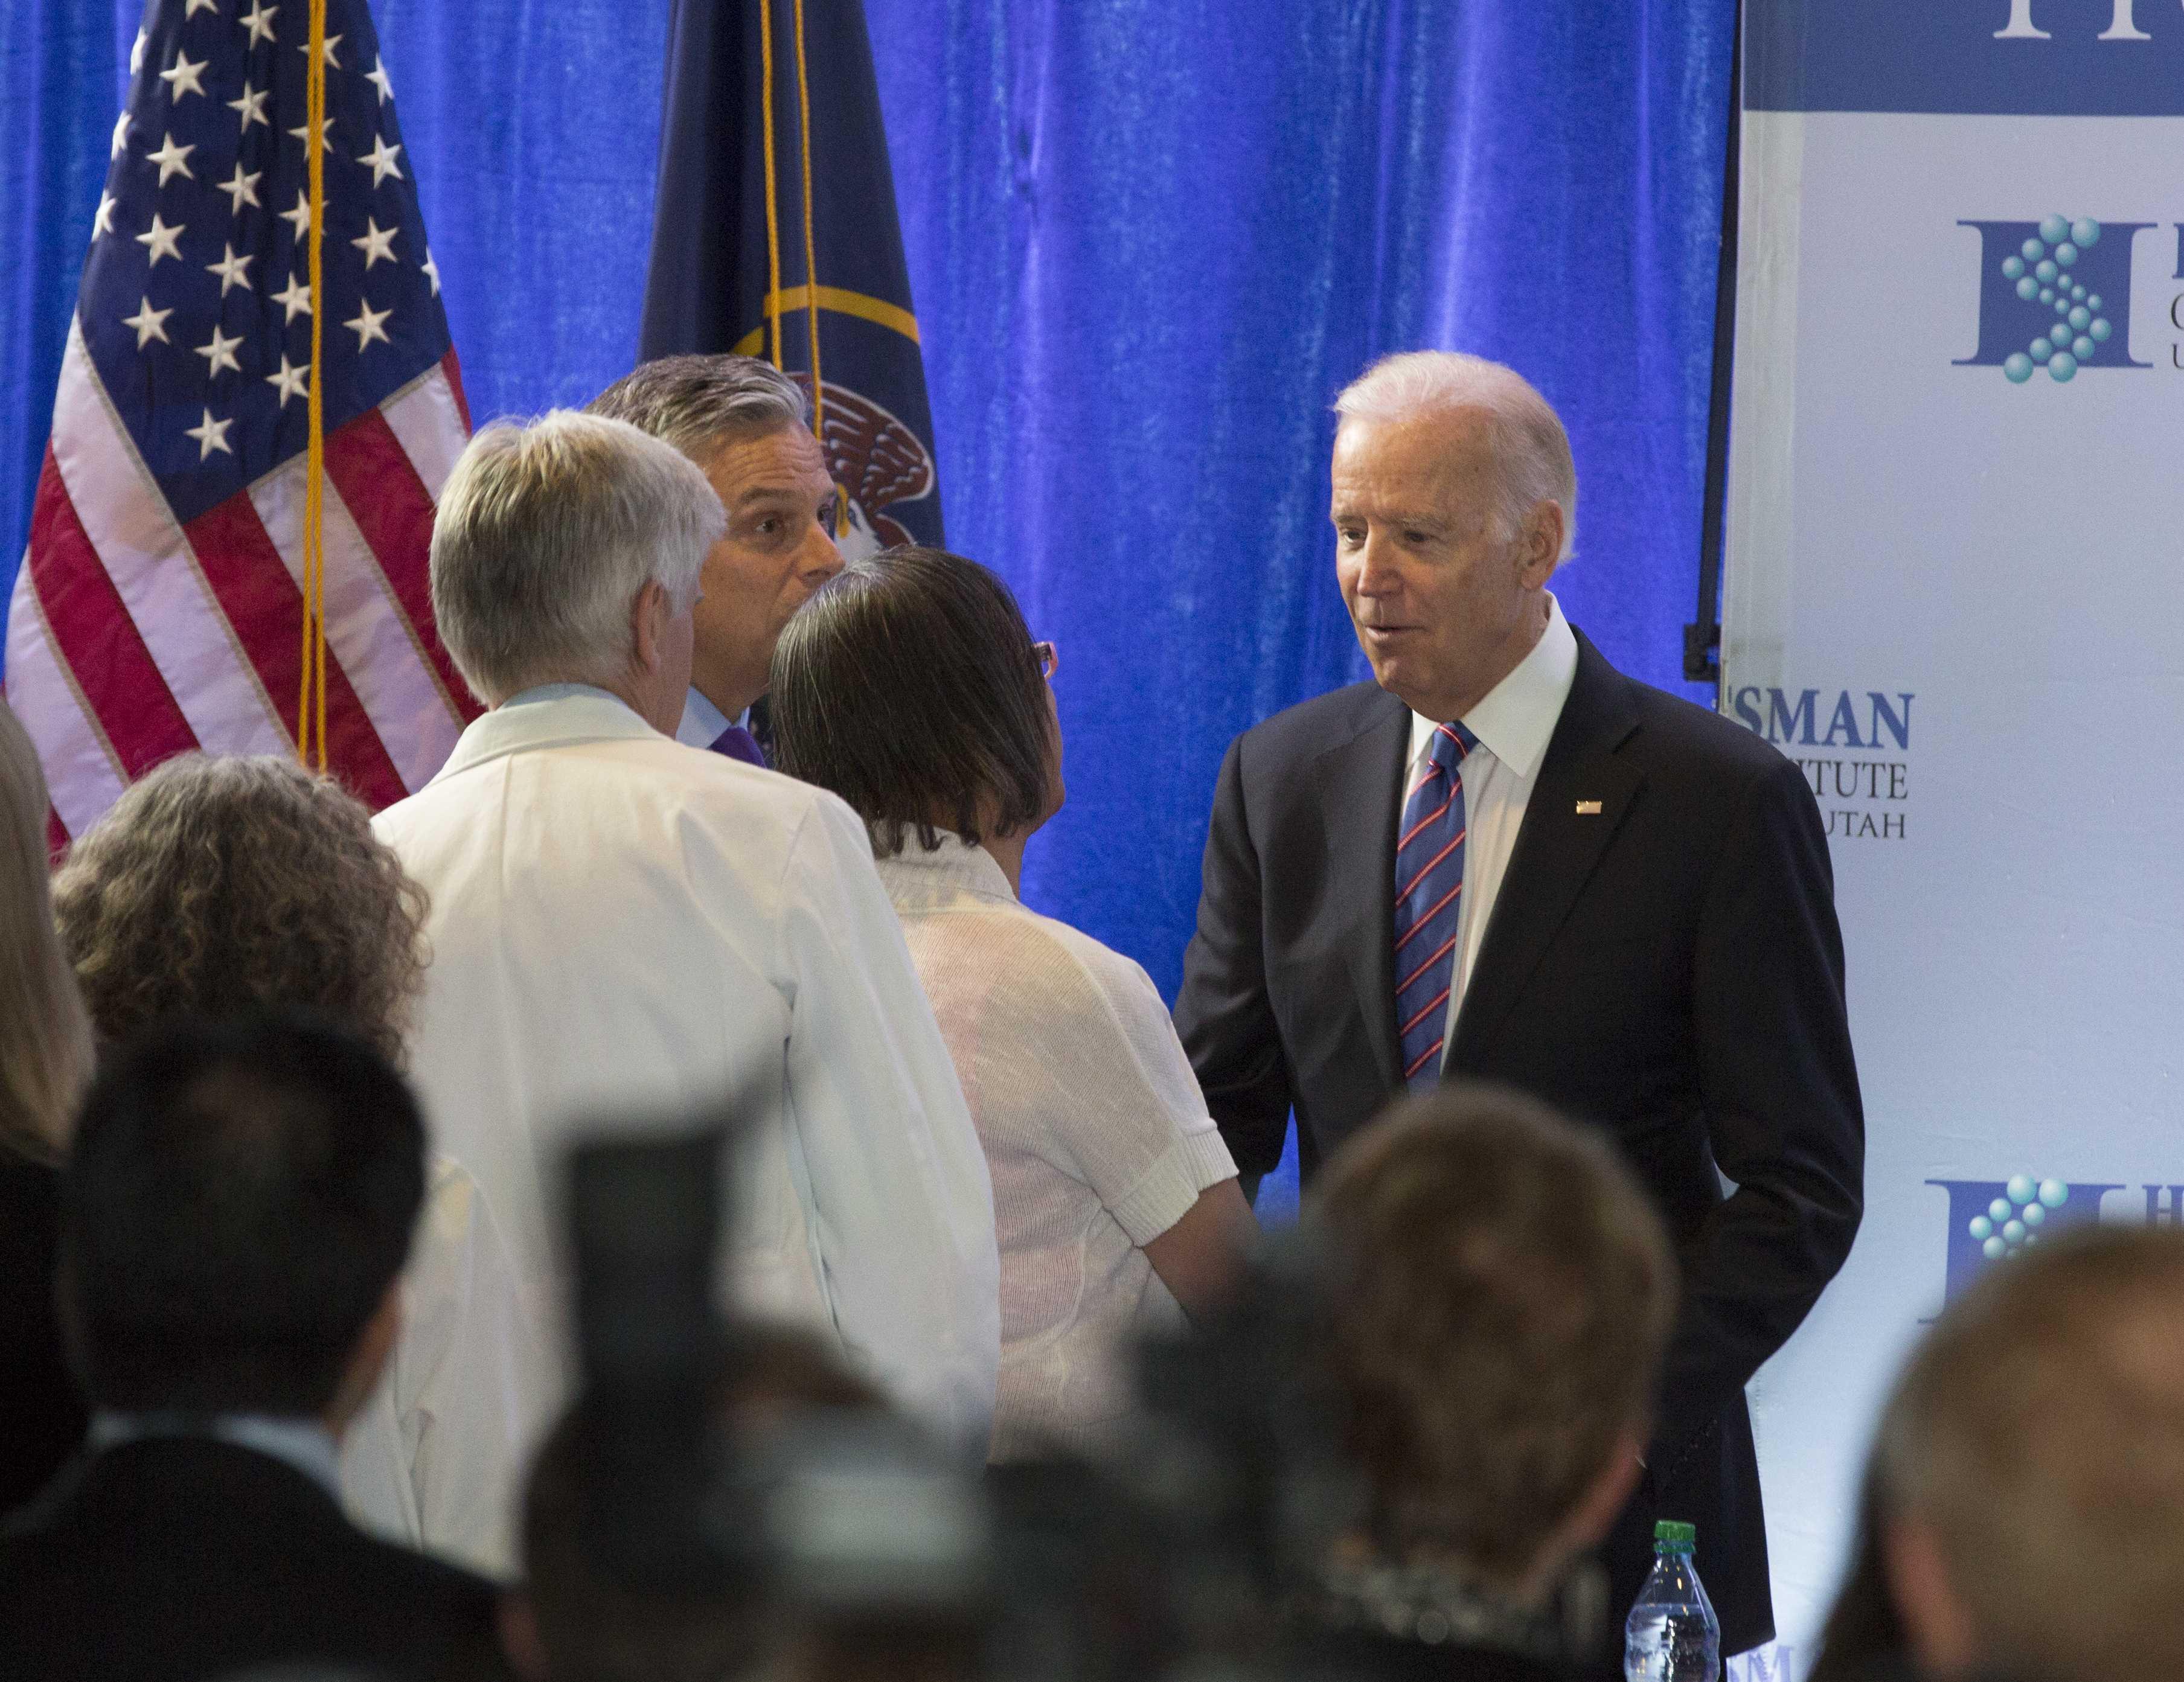 Vice President Joe Biden at the University of Utah in 2018. Chronicle archive.